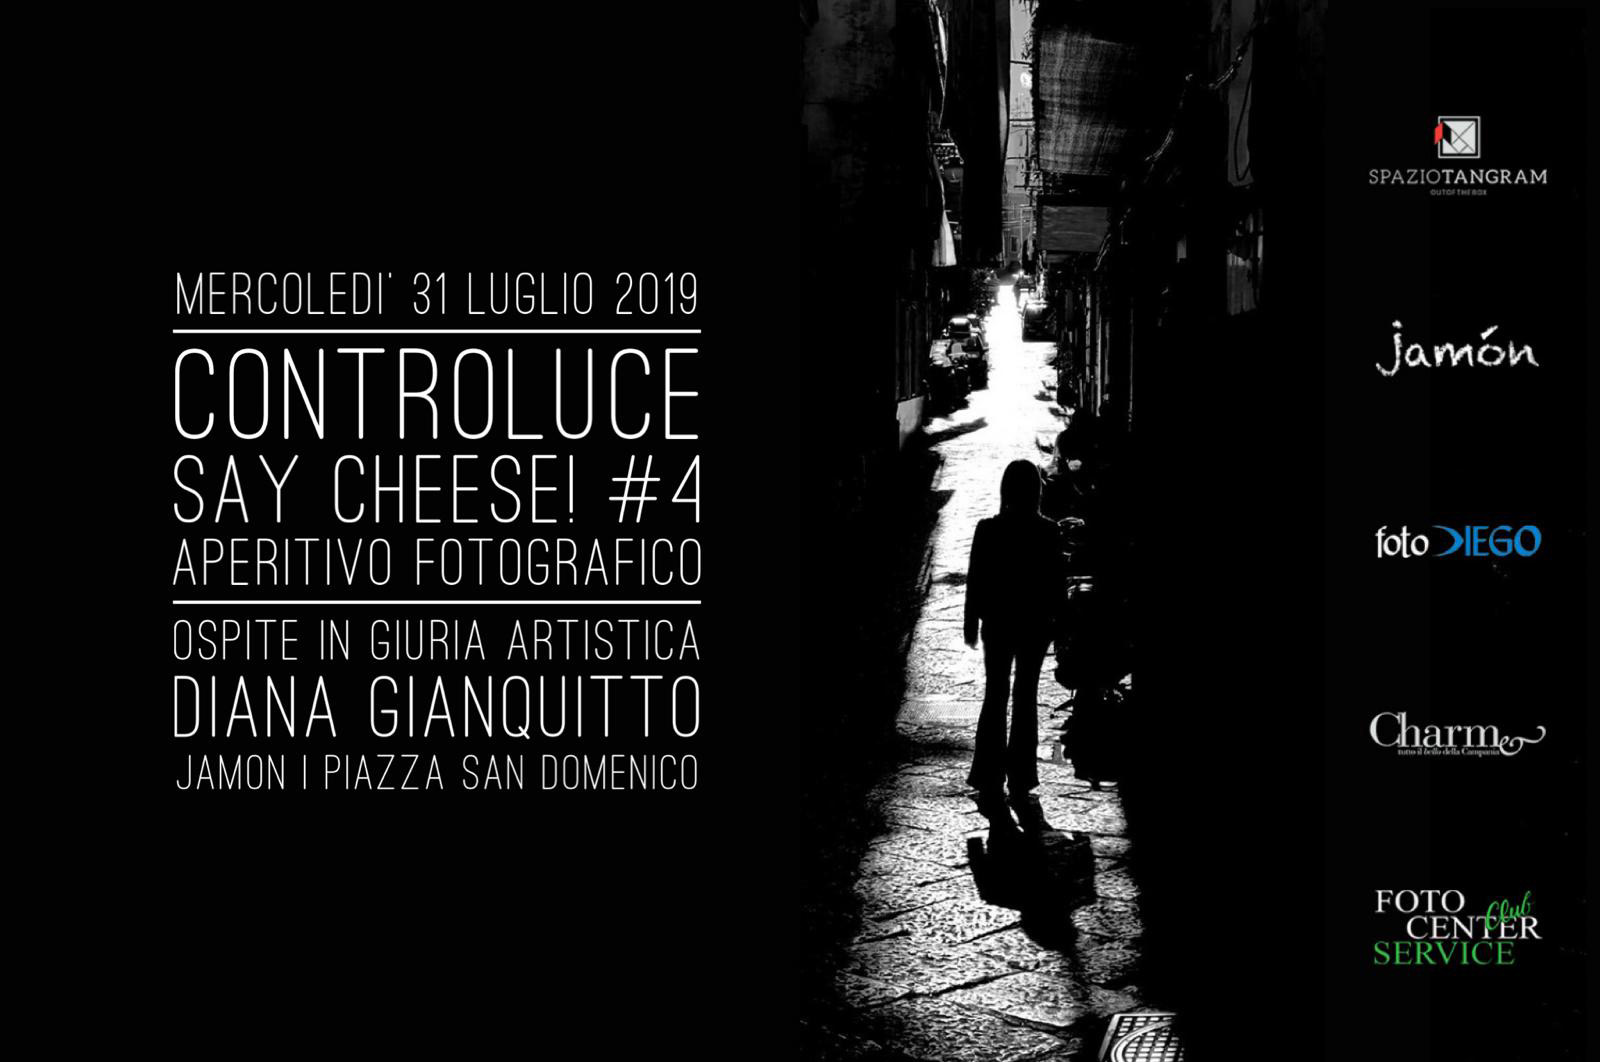 Say Cheese! #4 | aperitivo fotografico | Controluce